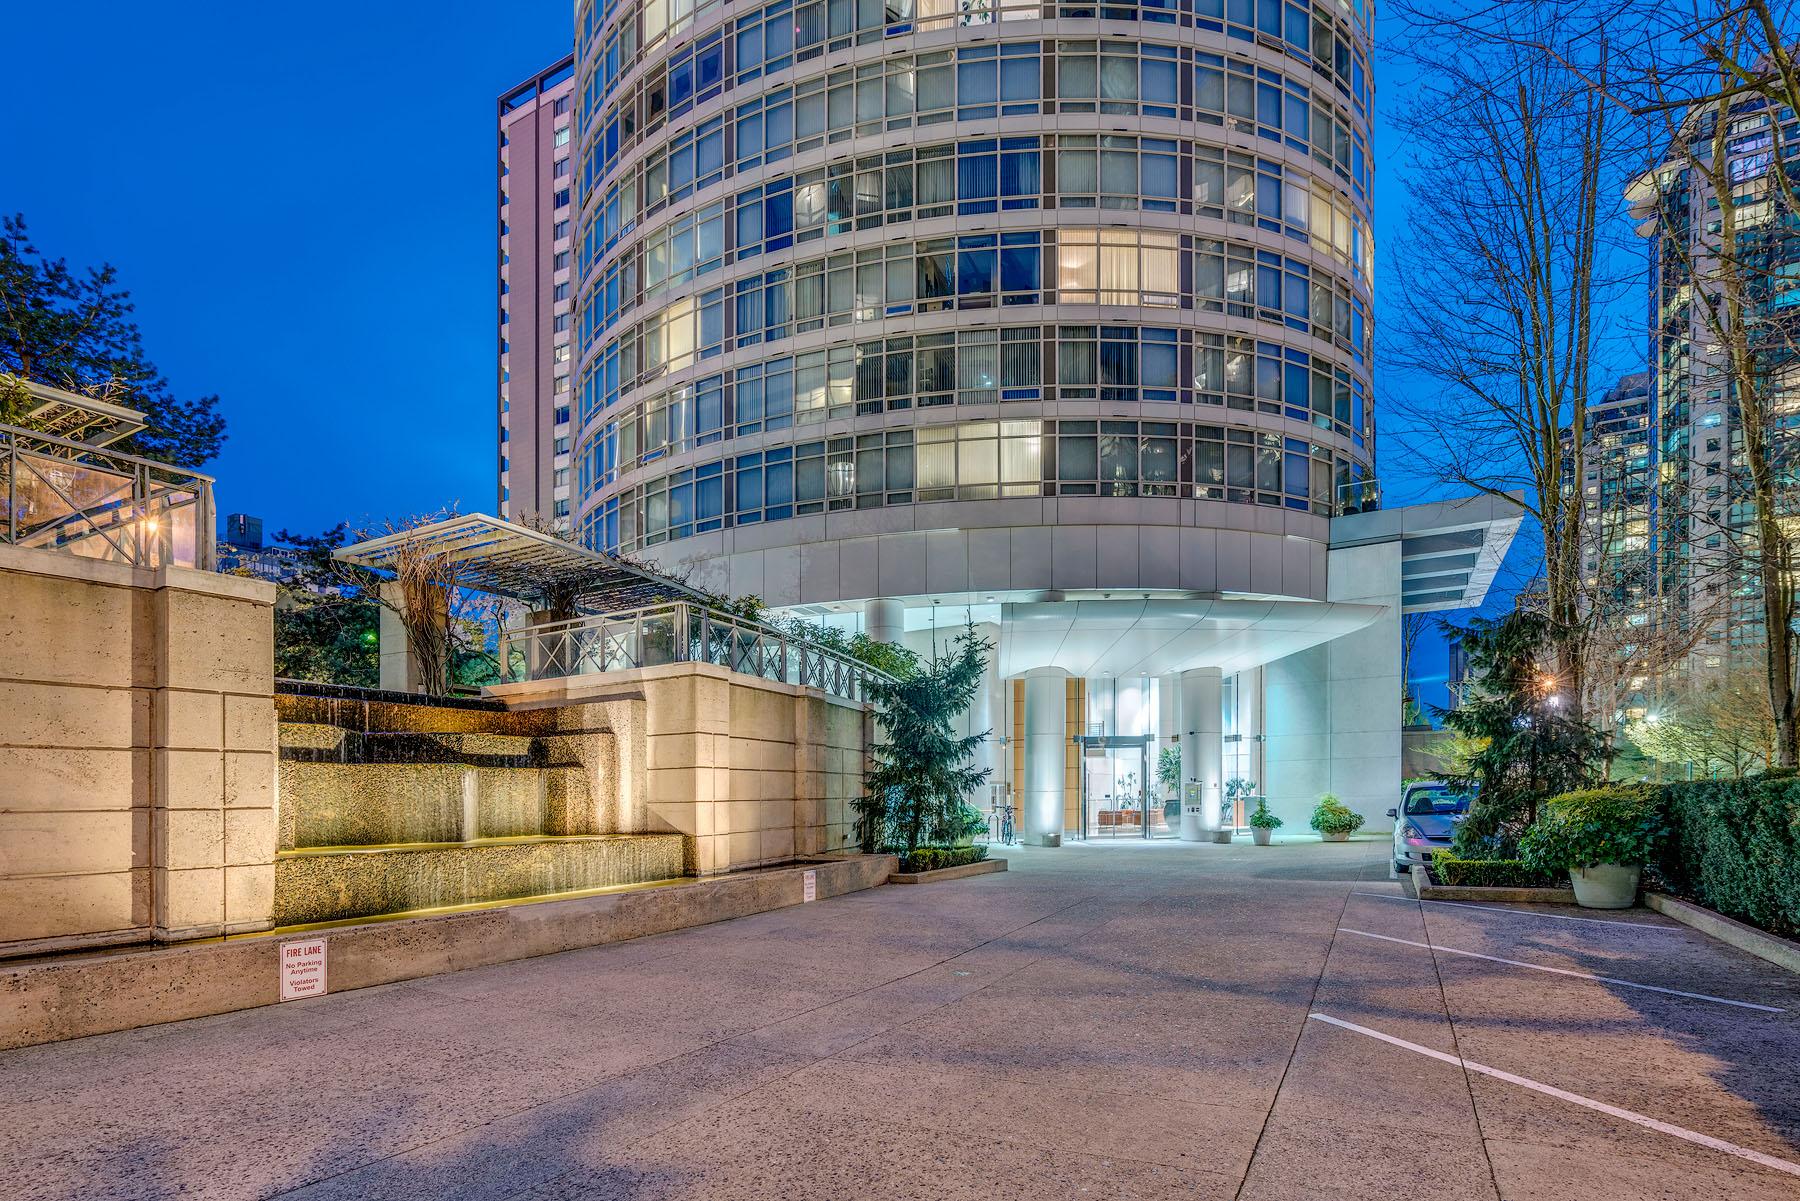 1605-1288-Alberni-Street-Vancouver-360hometours-22s.jpg